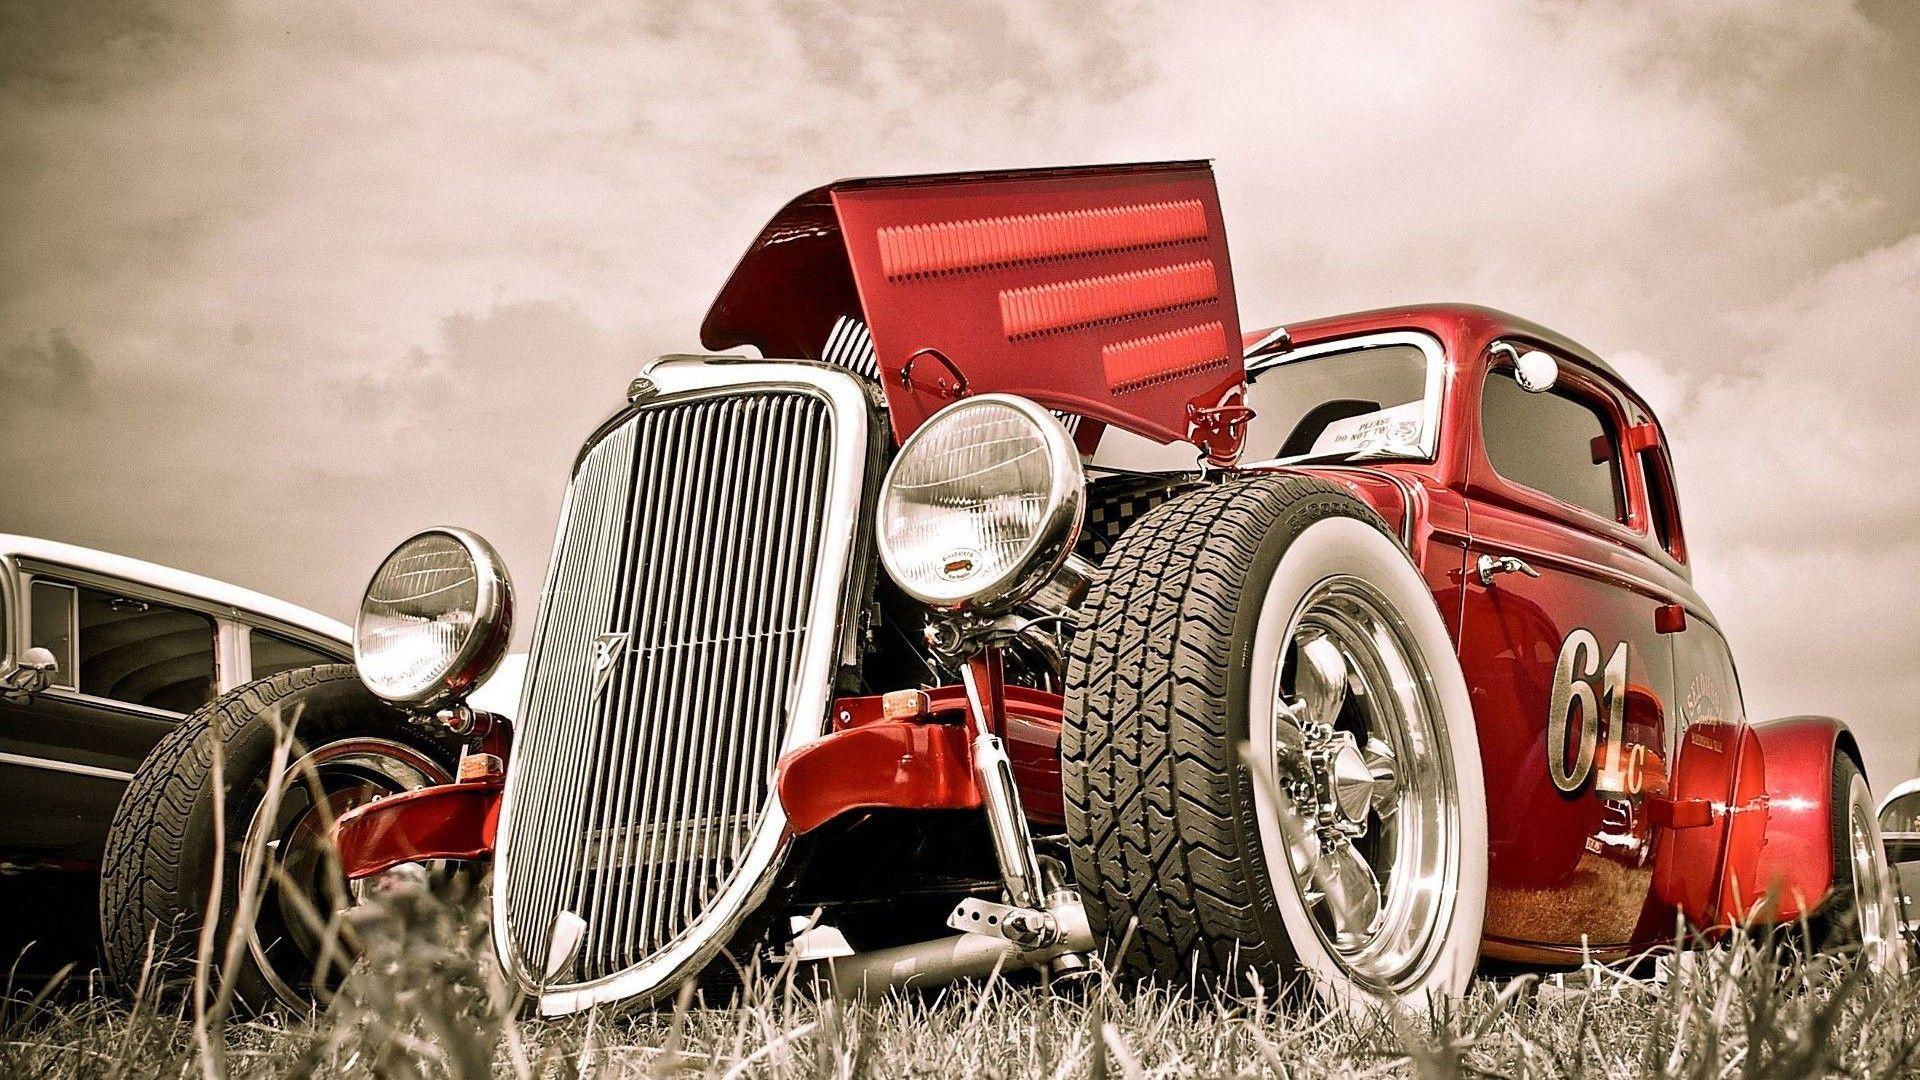 Vintage Cars blog post   Autos I Like   Pinterest   Car backgrounds ...